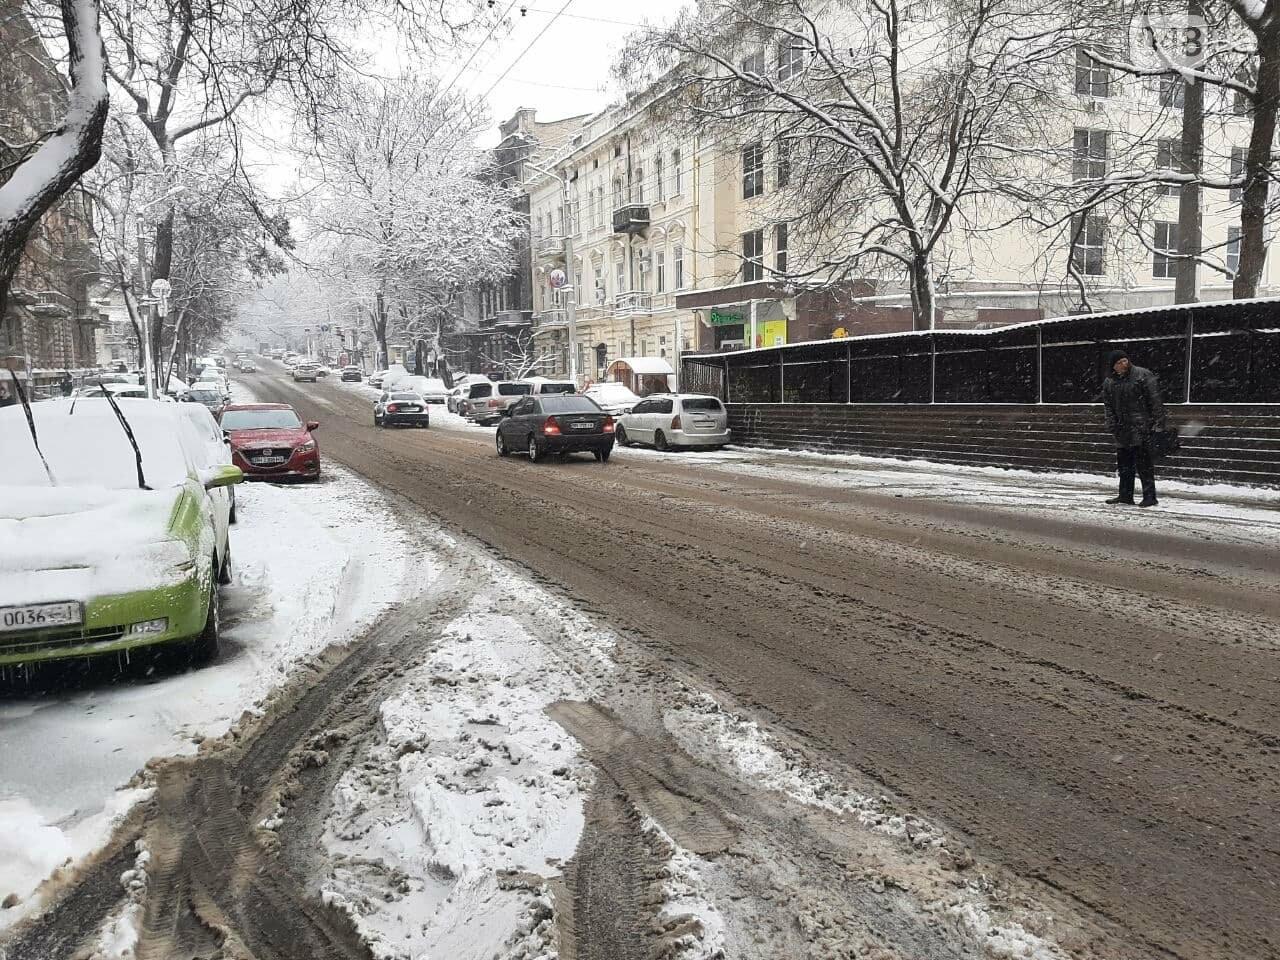 Одессу замело: ситуация на дорогах и тротуарах в городе, - ФОТО, фото-1